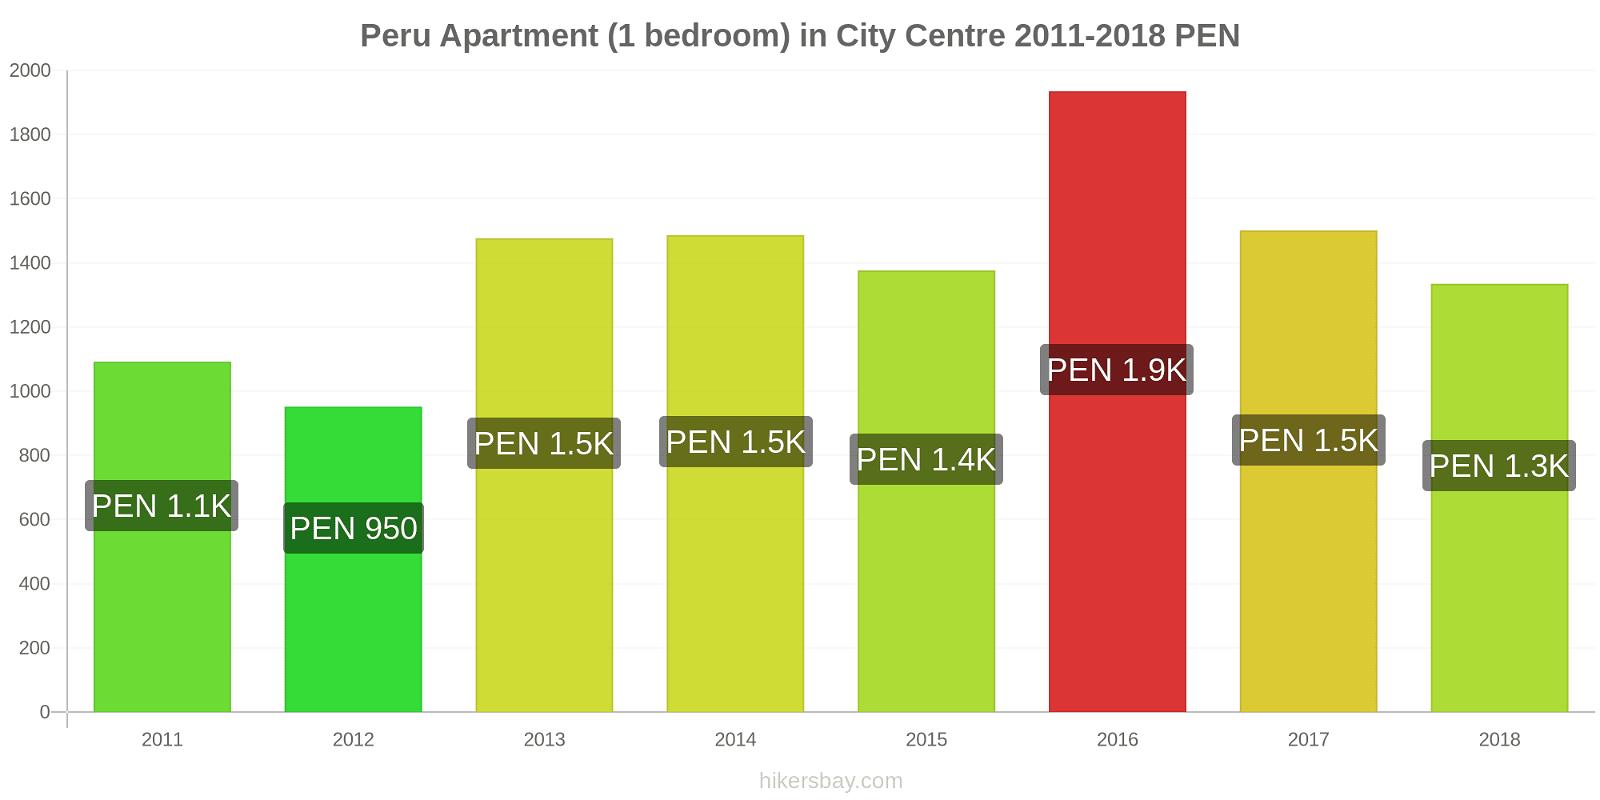 Peru price changes Apartment (1 bedroom) in City Centre hikersbay.com